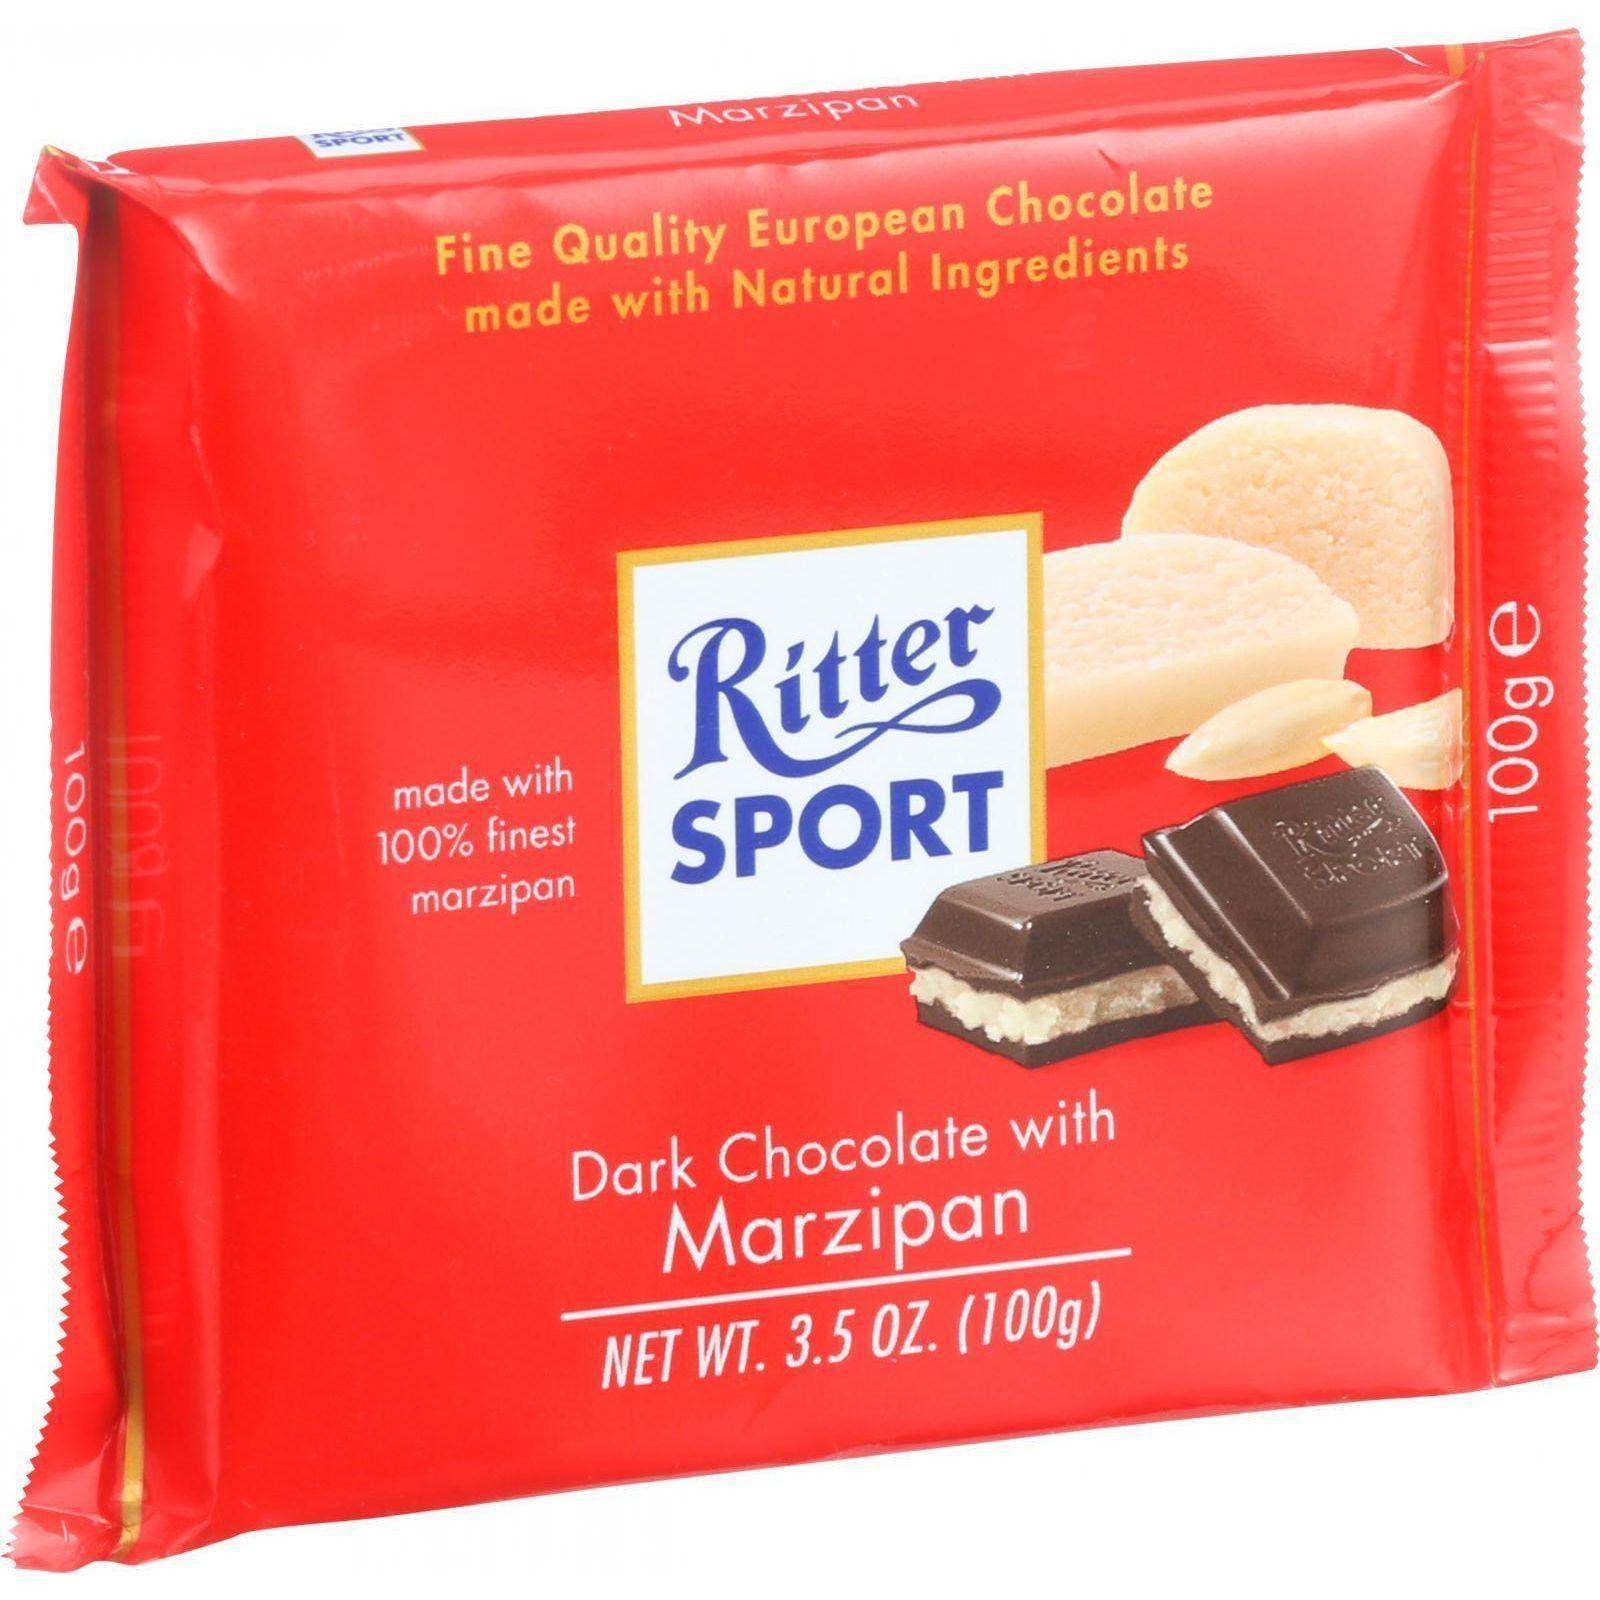 Ritter Sport Chocolate Bar Dark Chocolate Marzipan 3